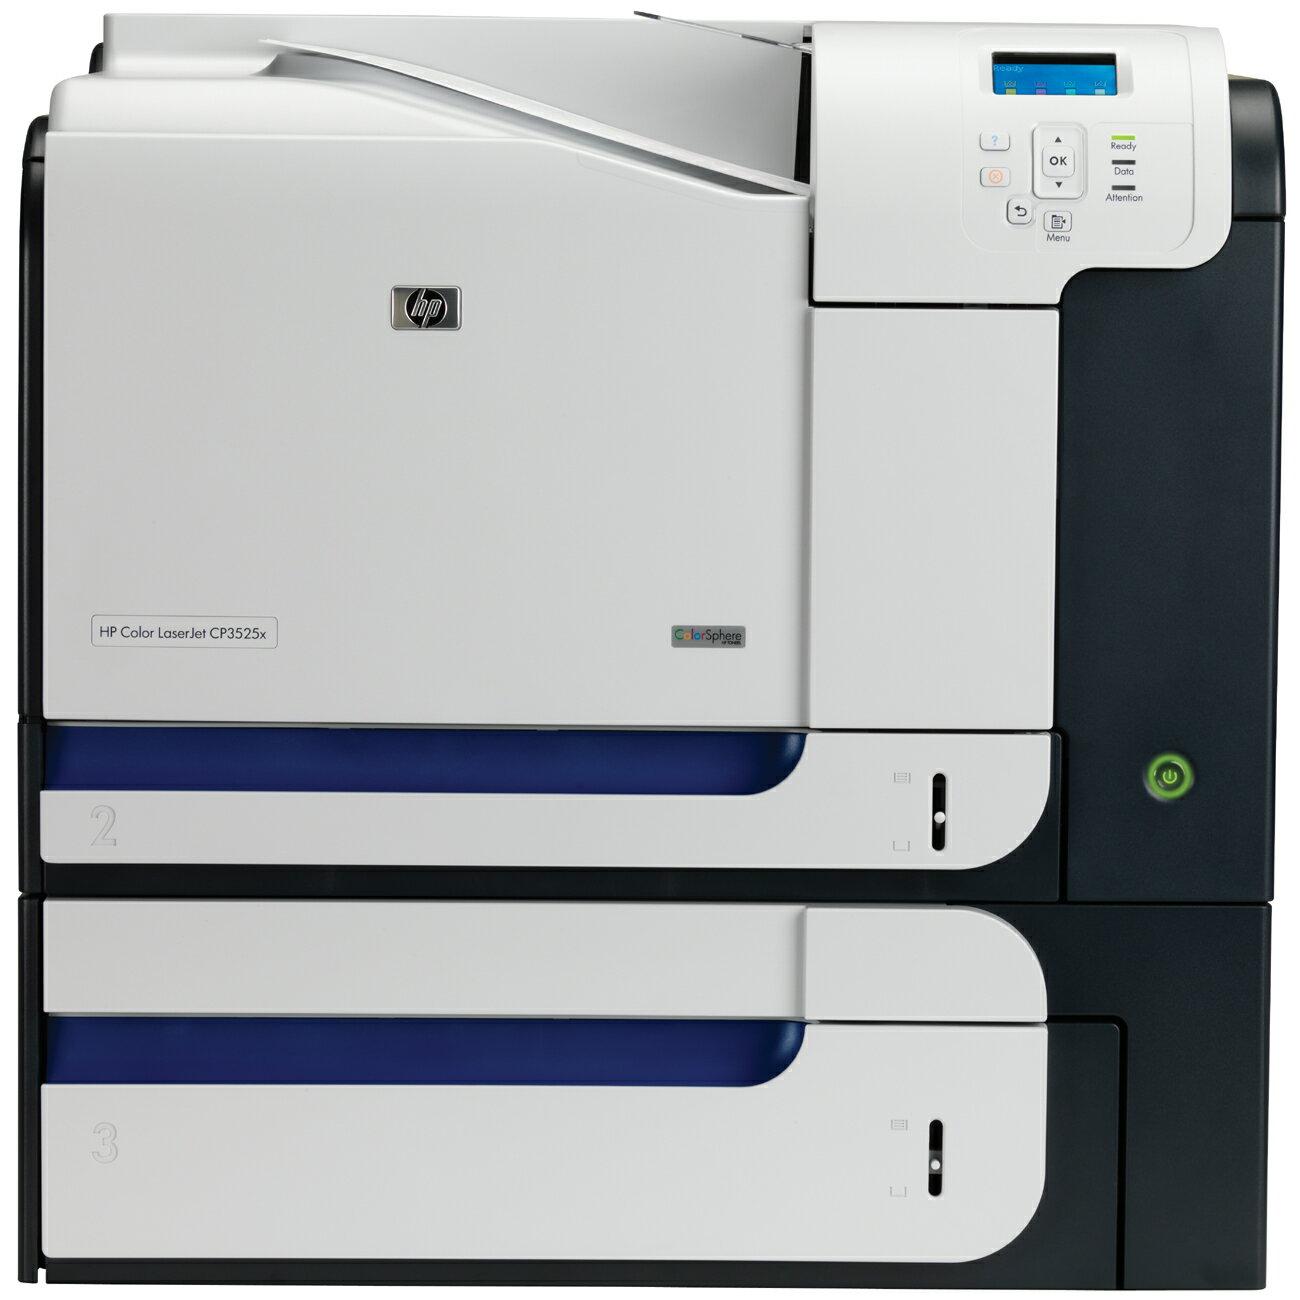 HP LaserJet CP3500 CP3525X Laser Printer - Color - 600 x 600 dpi Print - Plain Paper Print - Desktop - 30 ppm Mono / 30 ppm Color Print - Letter, Legal, Executive, Envelope No. 10, Envelope No. 7 3/4, Monarch Envelope - 850 sheets Standard Input Capacity 0